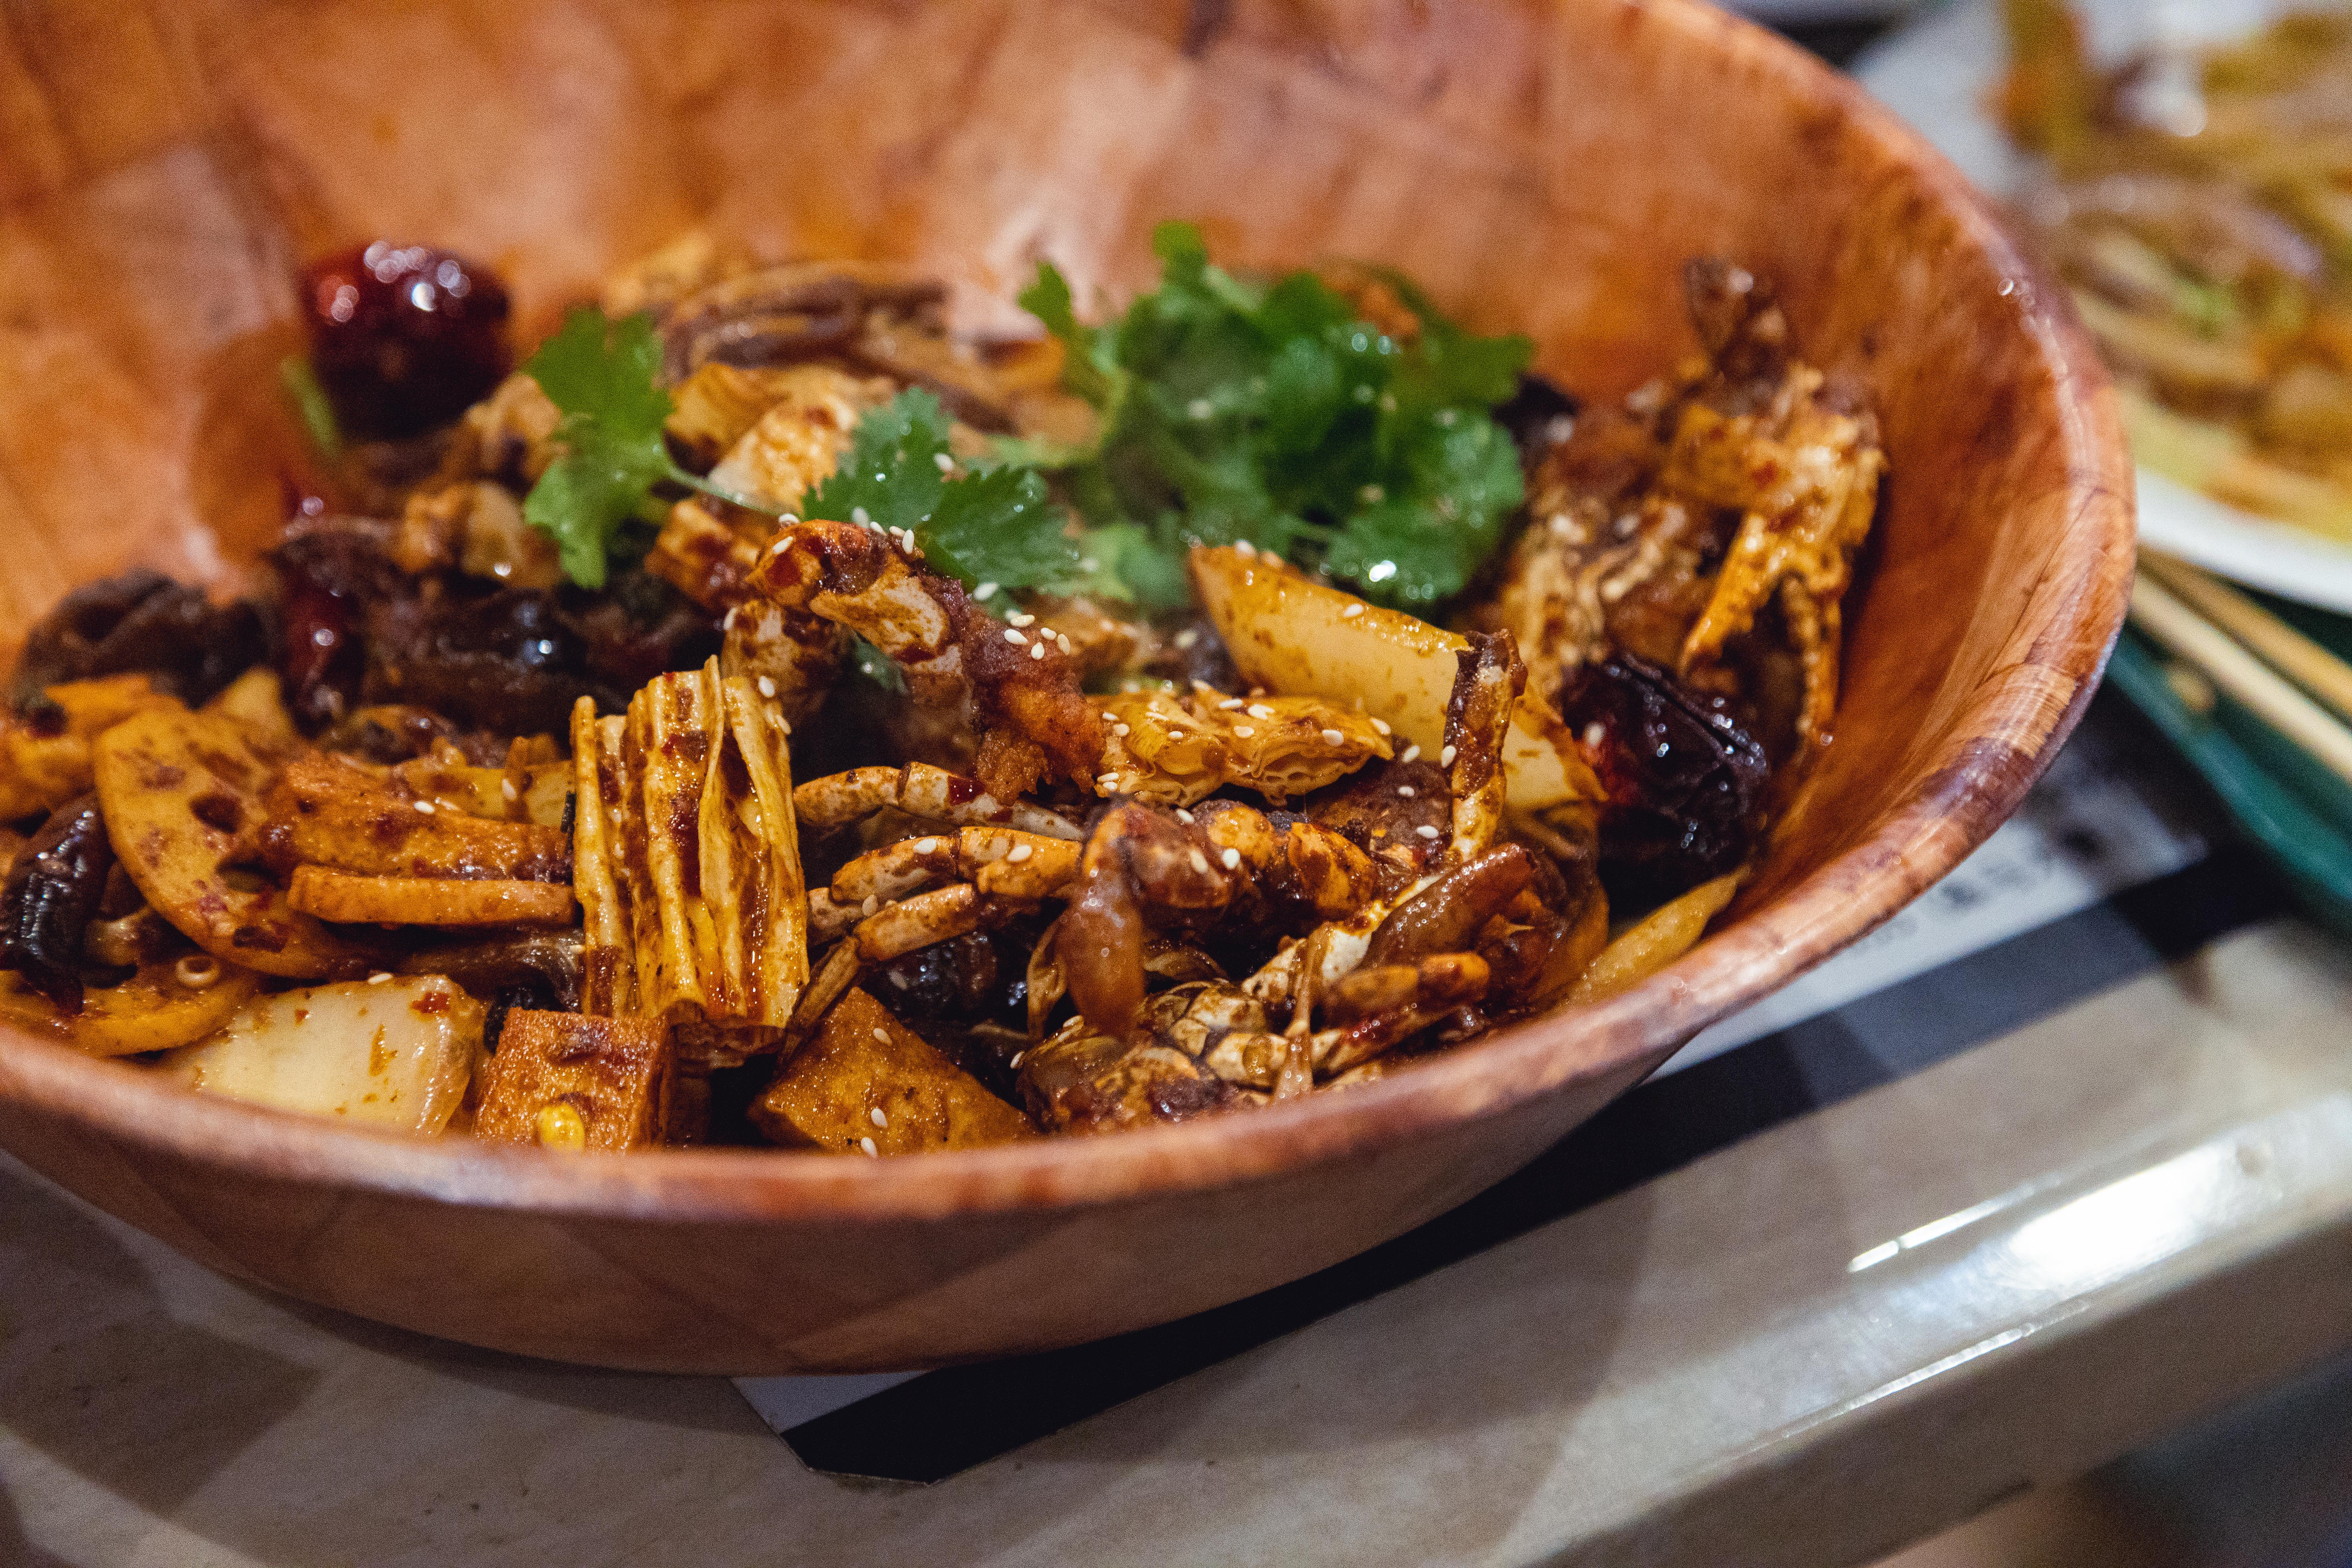 Laoma Malatang's dry pot